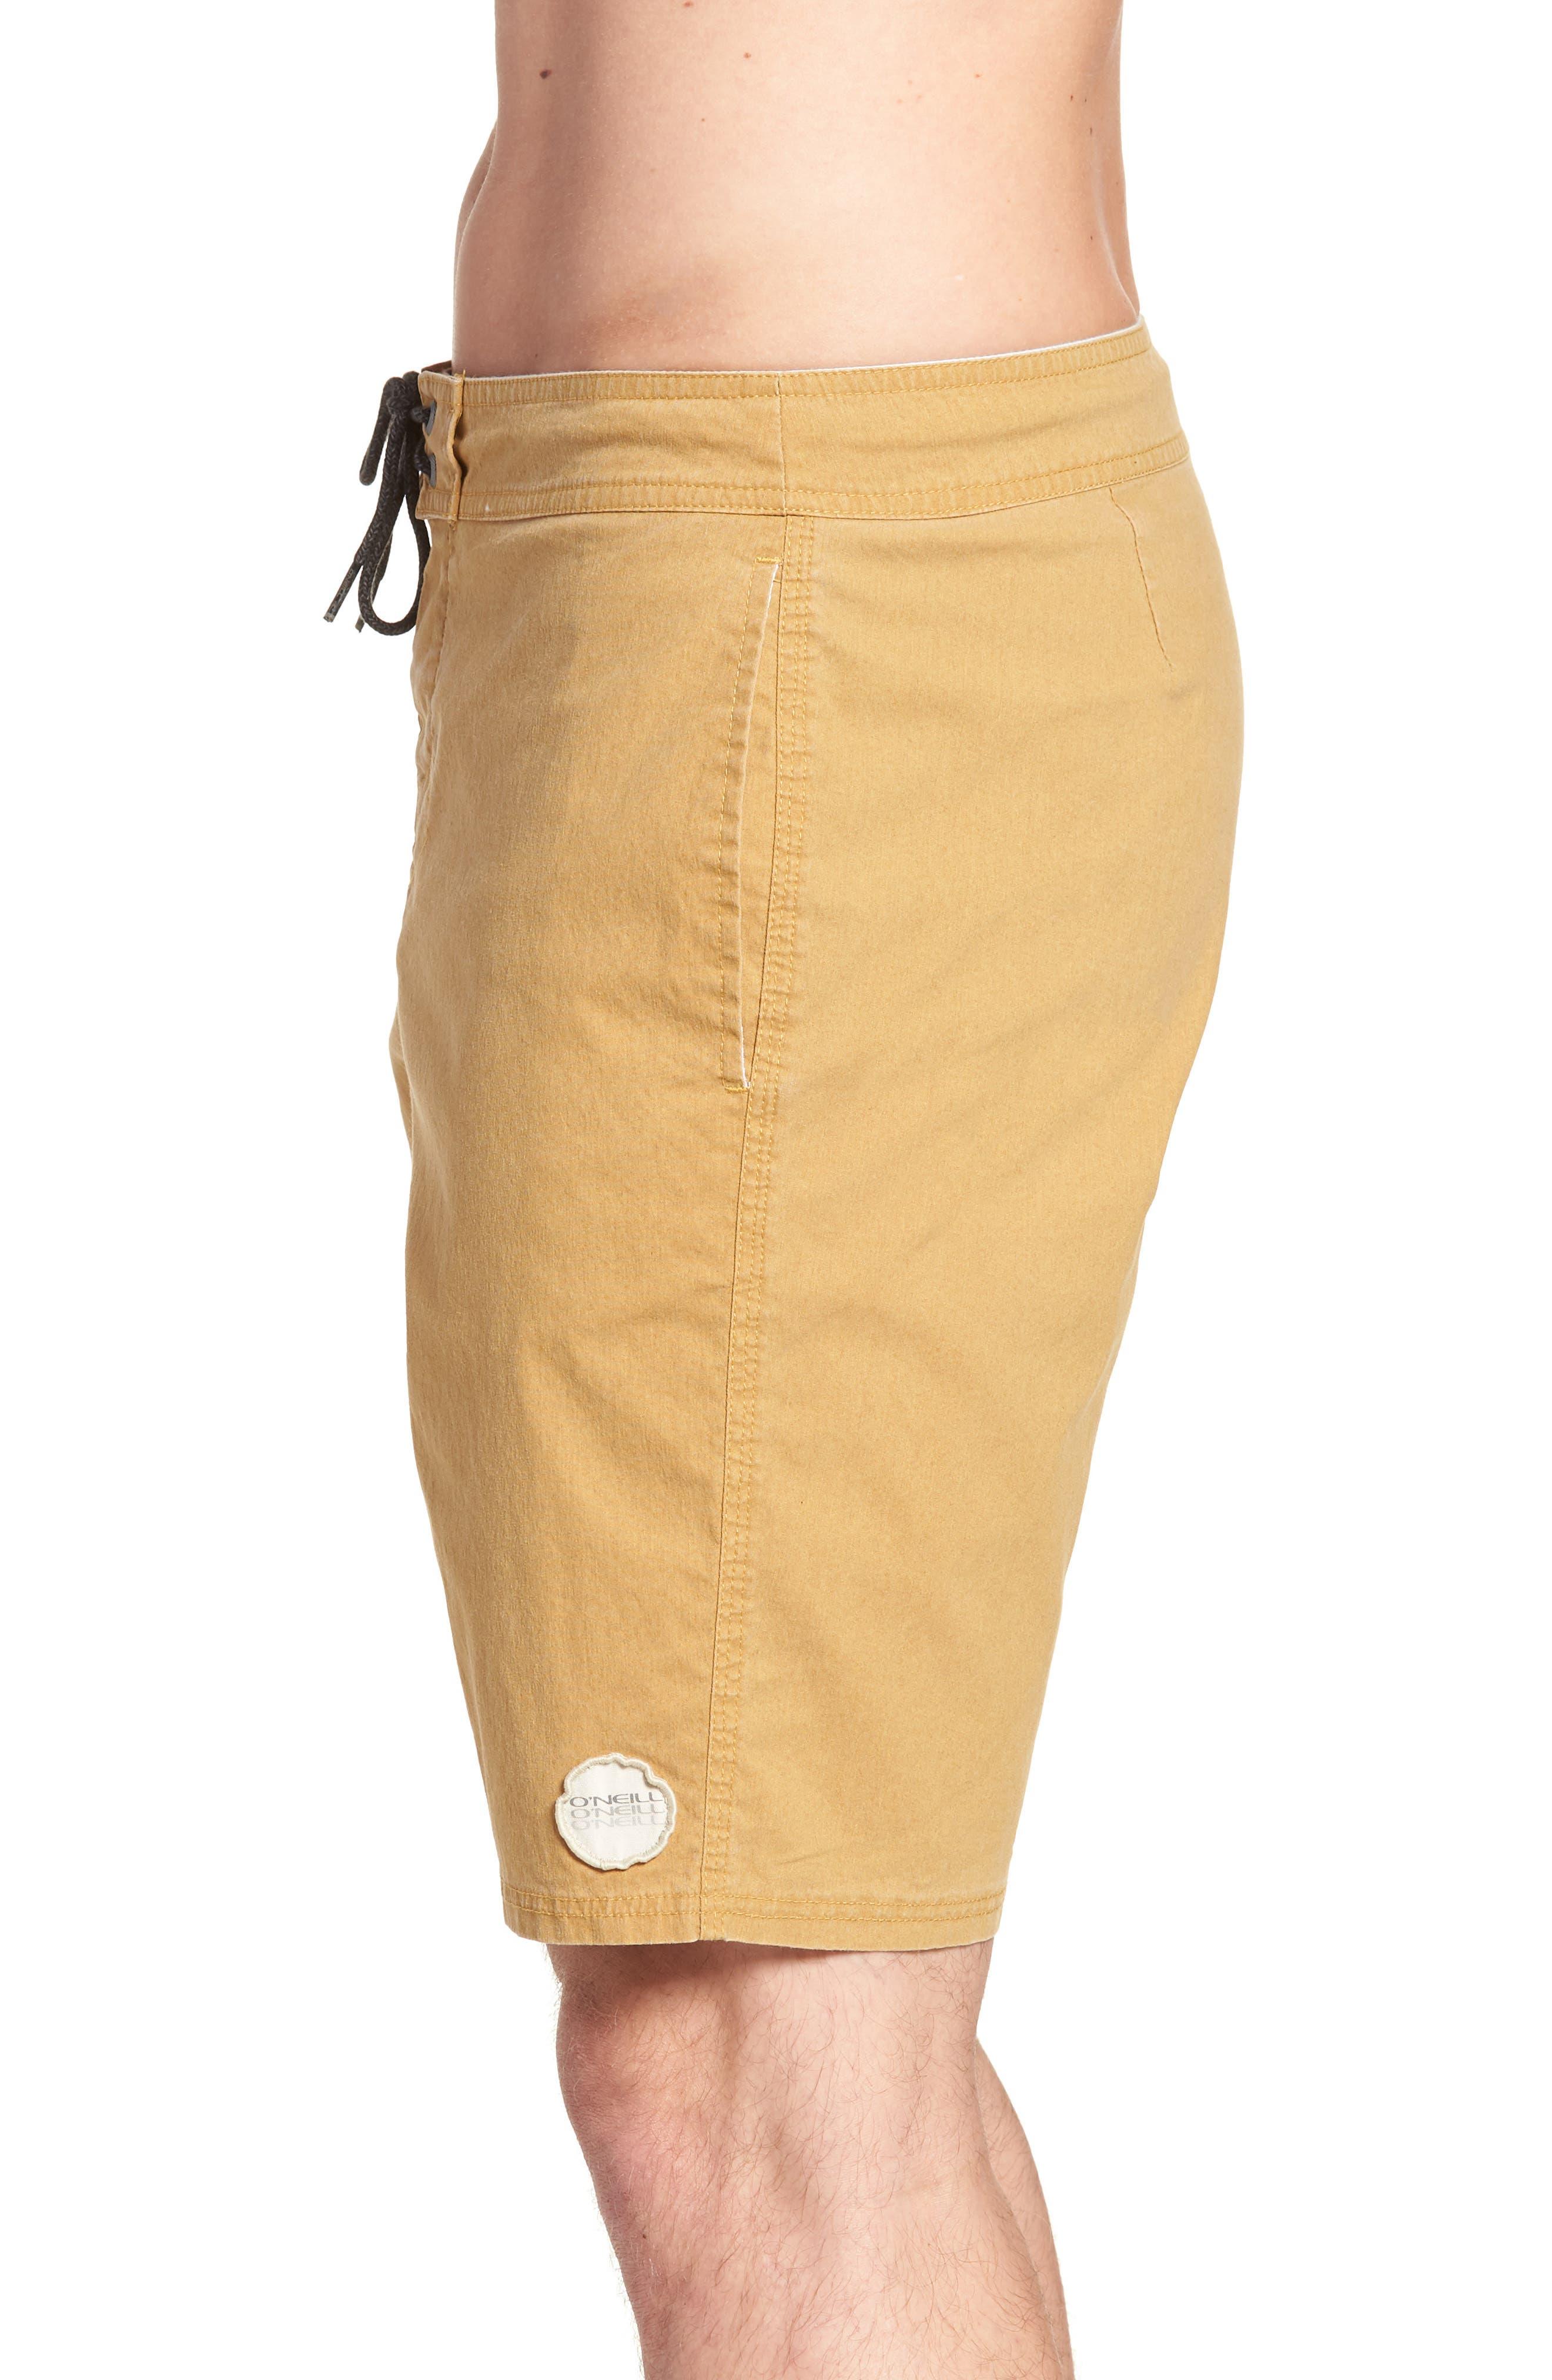 Faded Cruzer Board Shorts,                             Alternate thumbnail 3, color,                             206